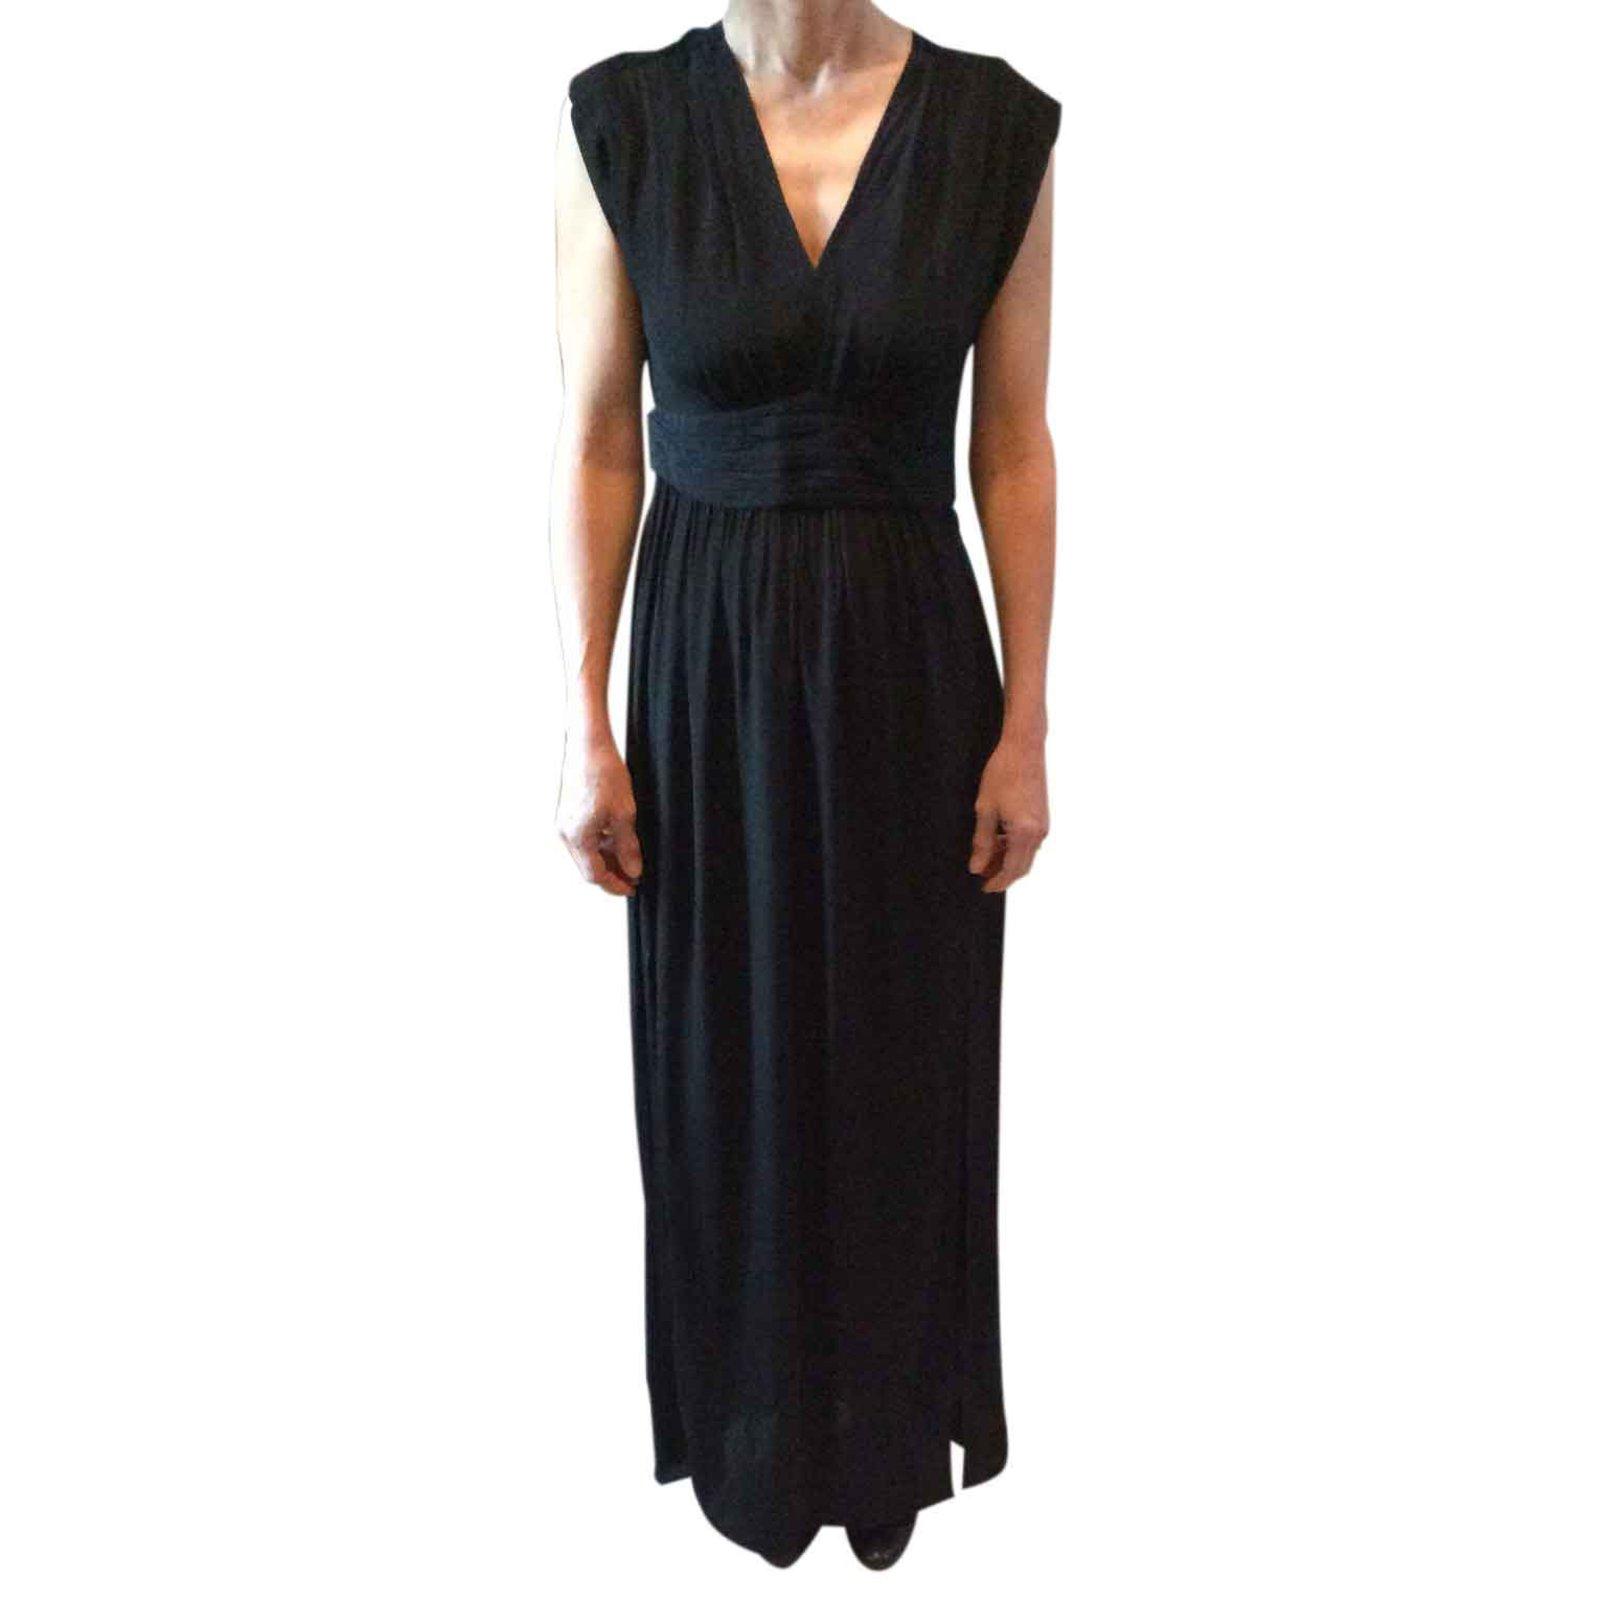 Gerard Darel Dress Dresses Viscose Black Ref 25564 Joli Closet